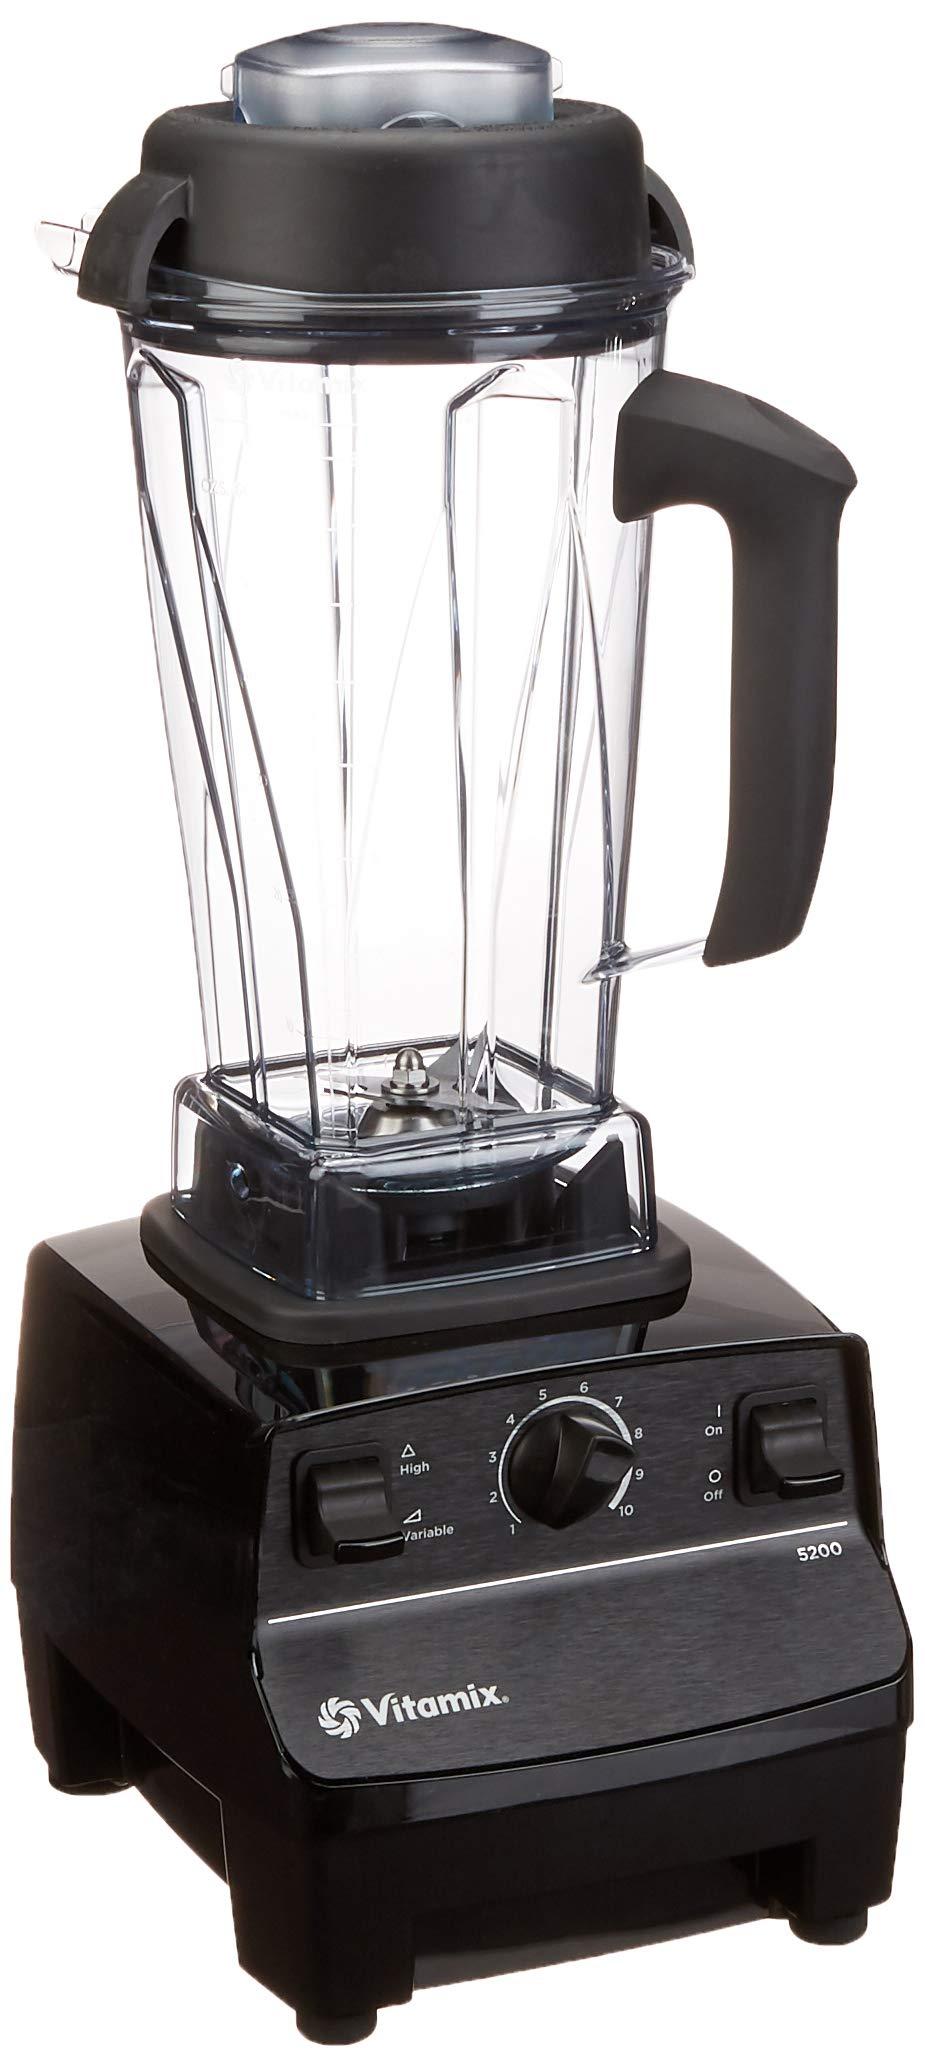 Vitamix 5200 Blender Professional-Grade, 64 oz. Container, Black by Vitamix